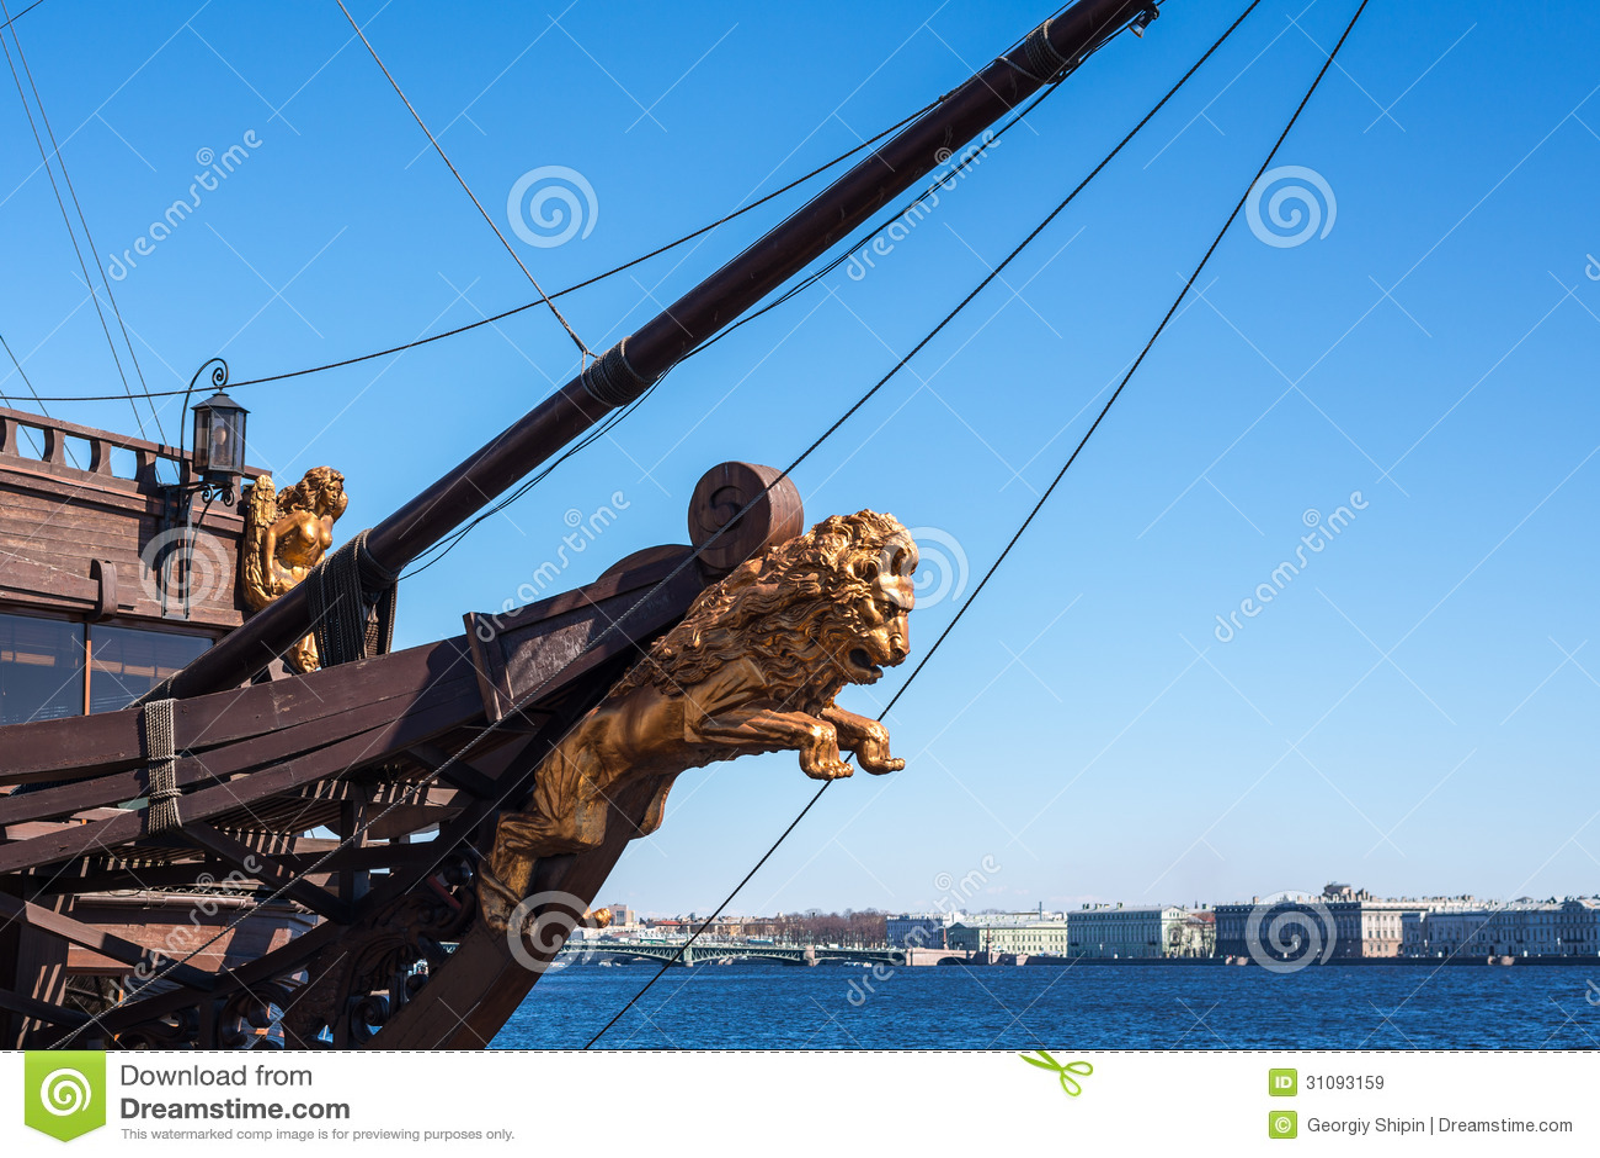 sail ship royalty free stock images image 31093159